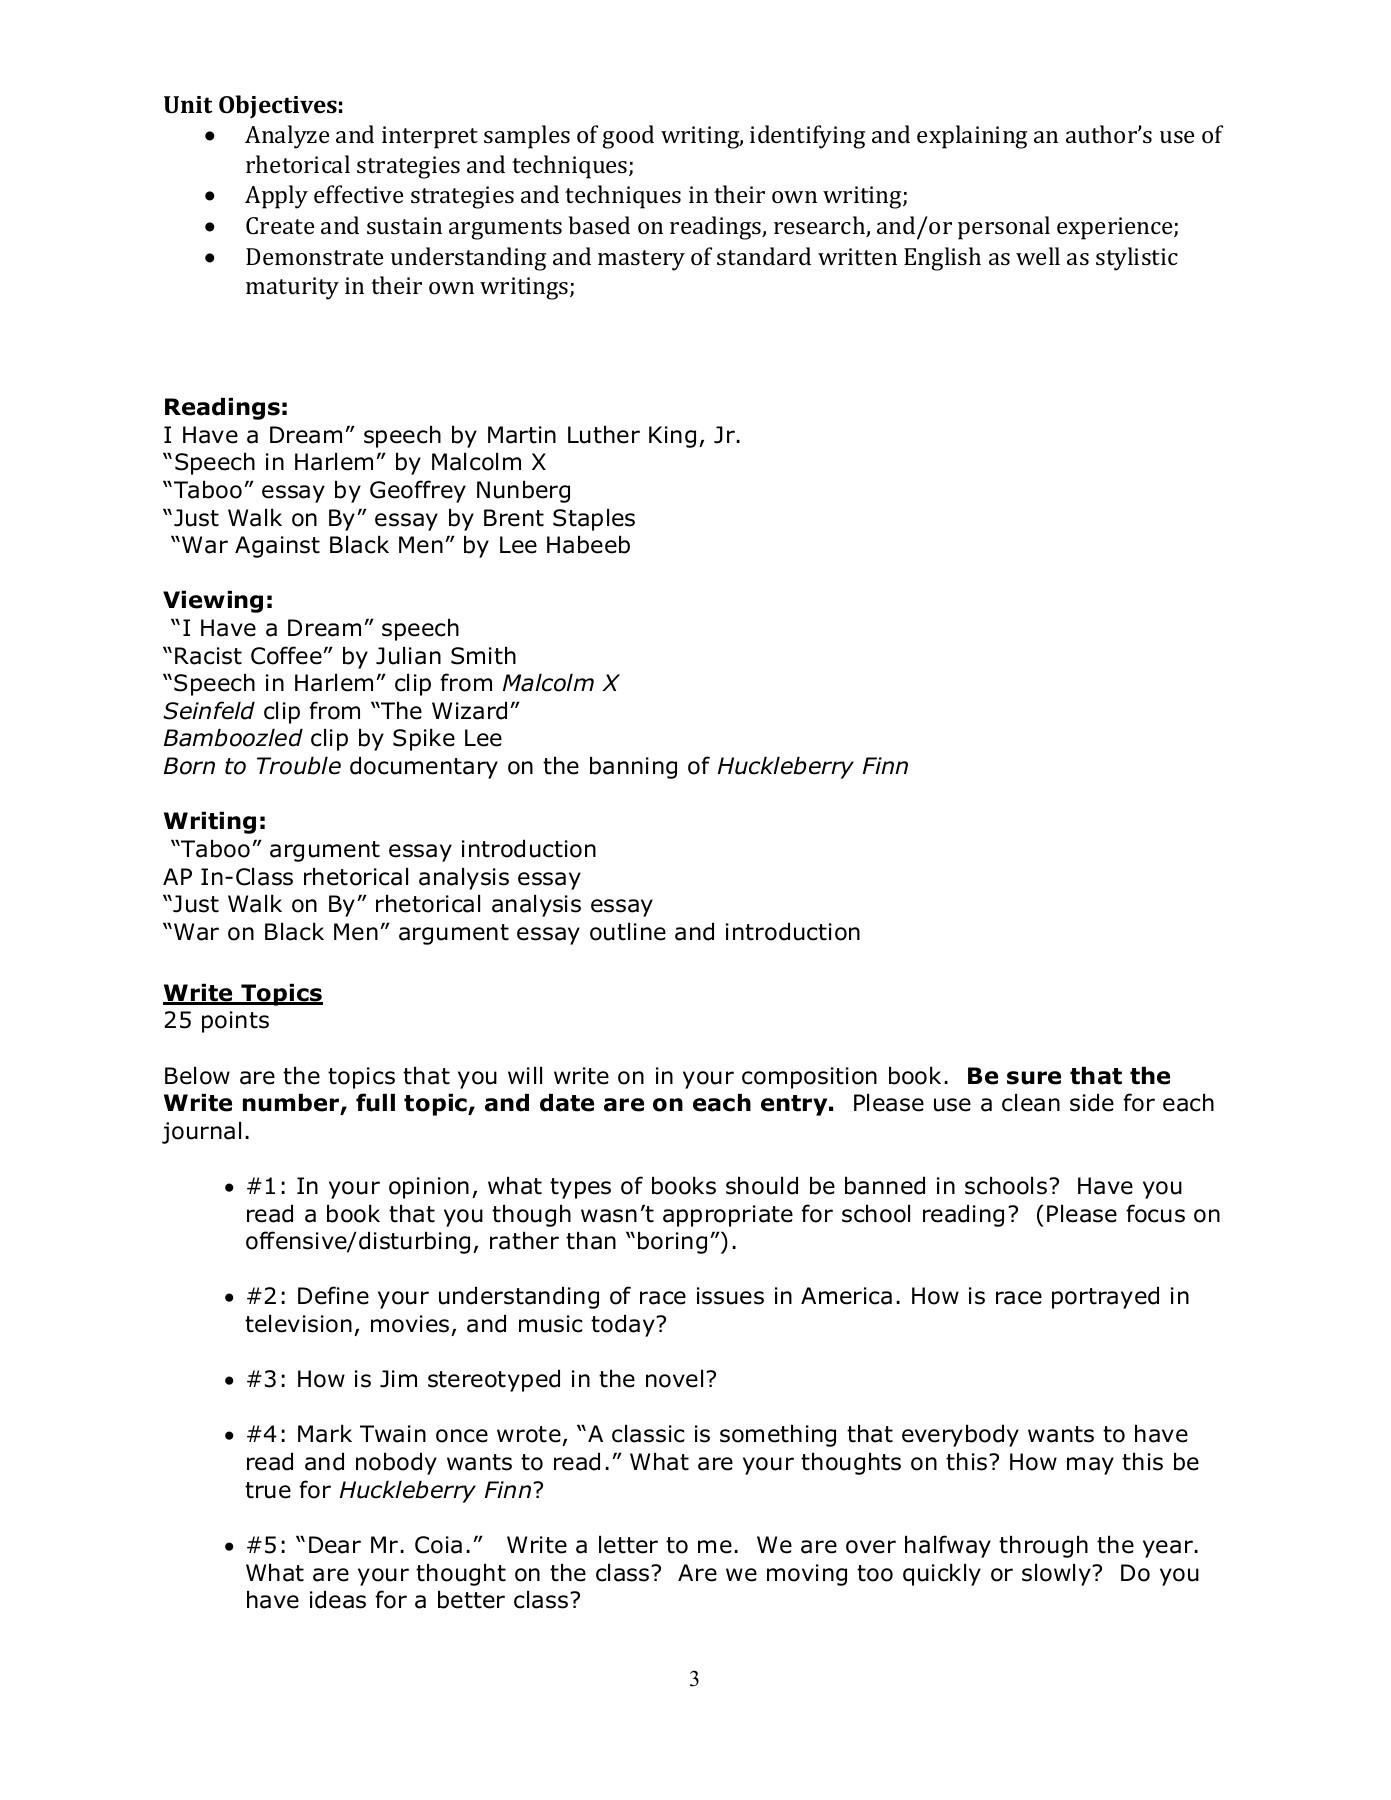 006 Just Walk On By Essay Frightening Rhetorical Analysis Brent Staples 50 Essays Main Idea Full